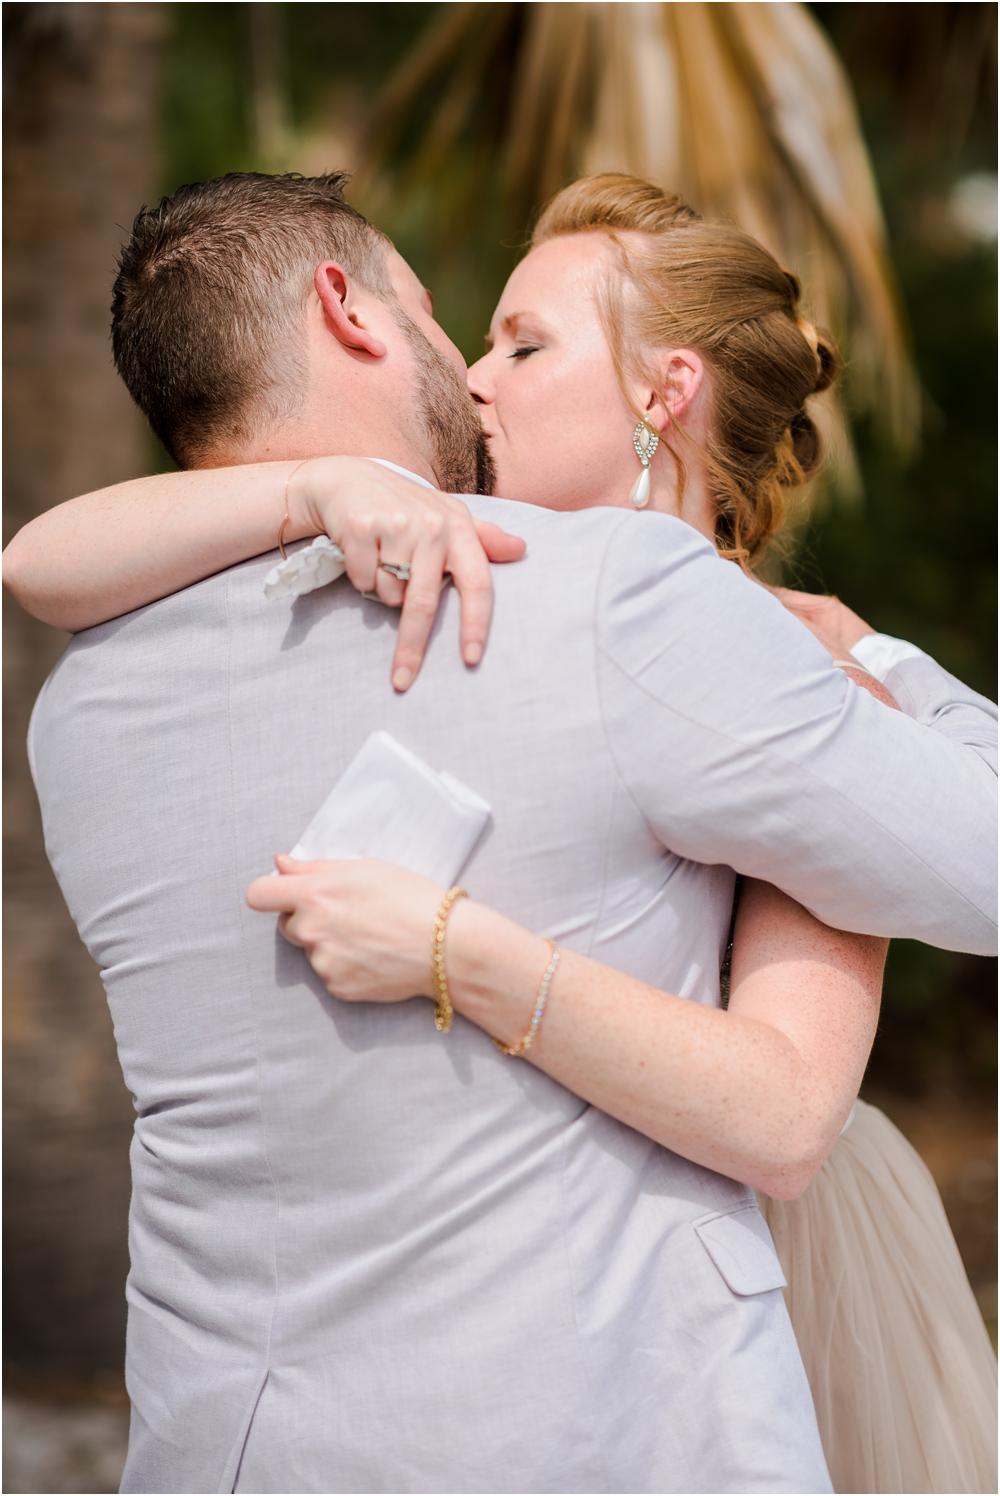 st-joe-florida-wedding-photographer-kiersten-grant-36.jpg